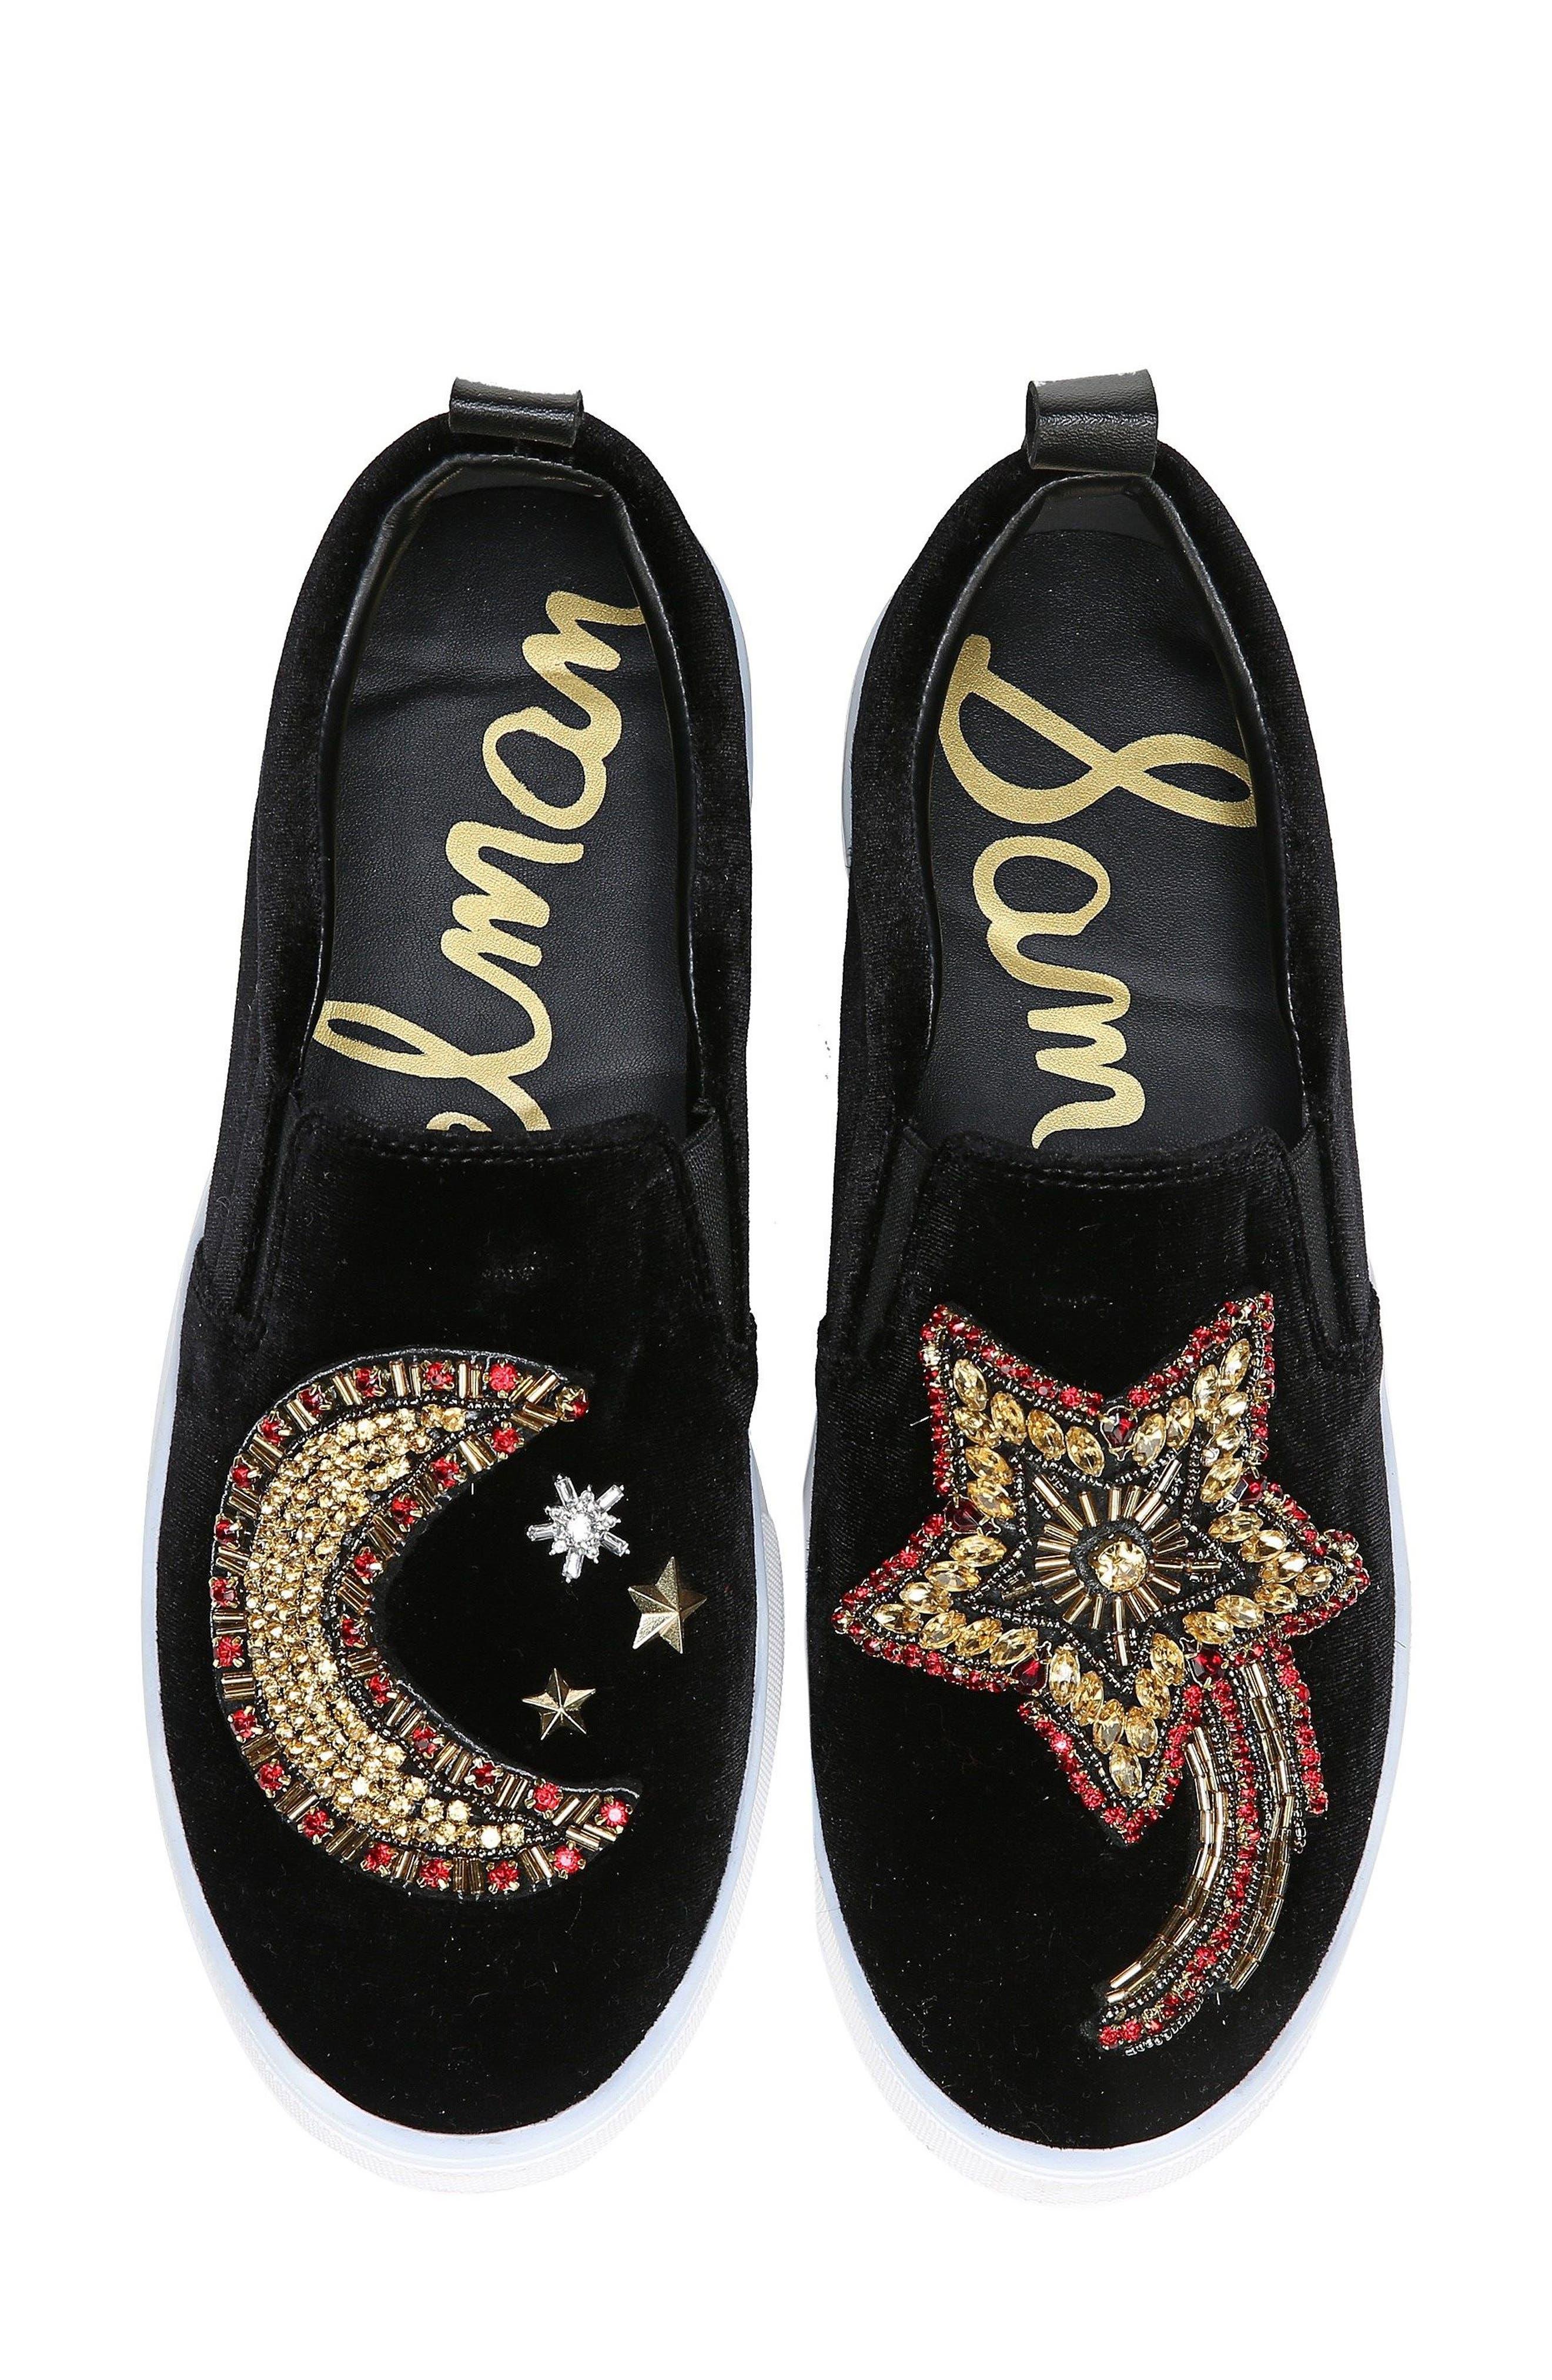 Alternate Image 1 Selected - Sam Edelman Leila Embellished Platform Sneaker (Women)